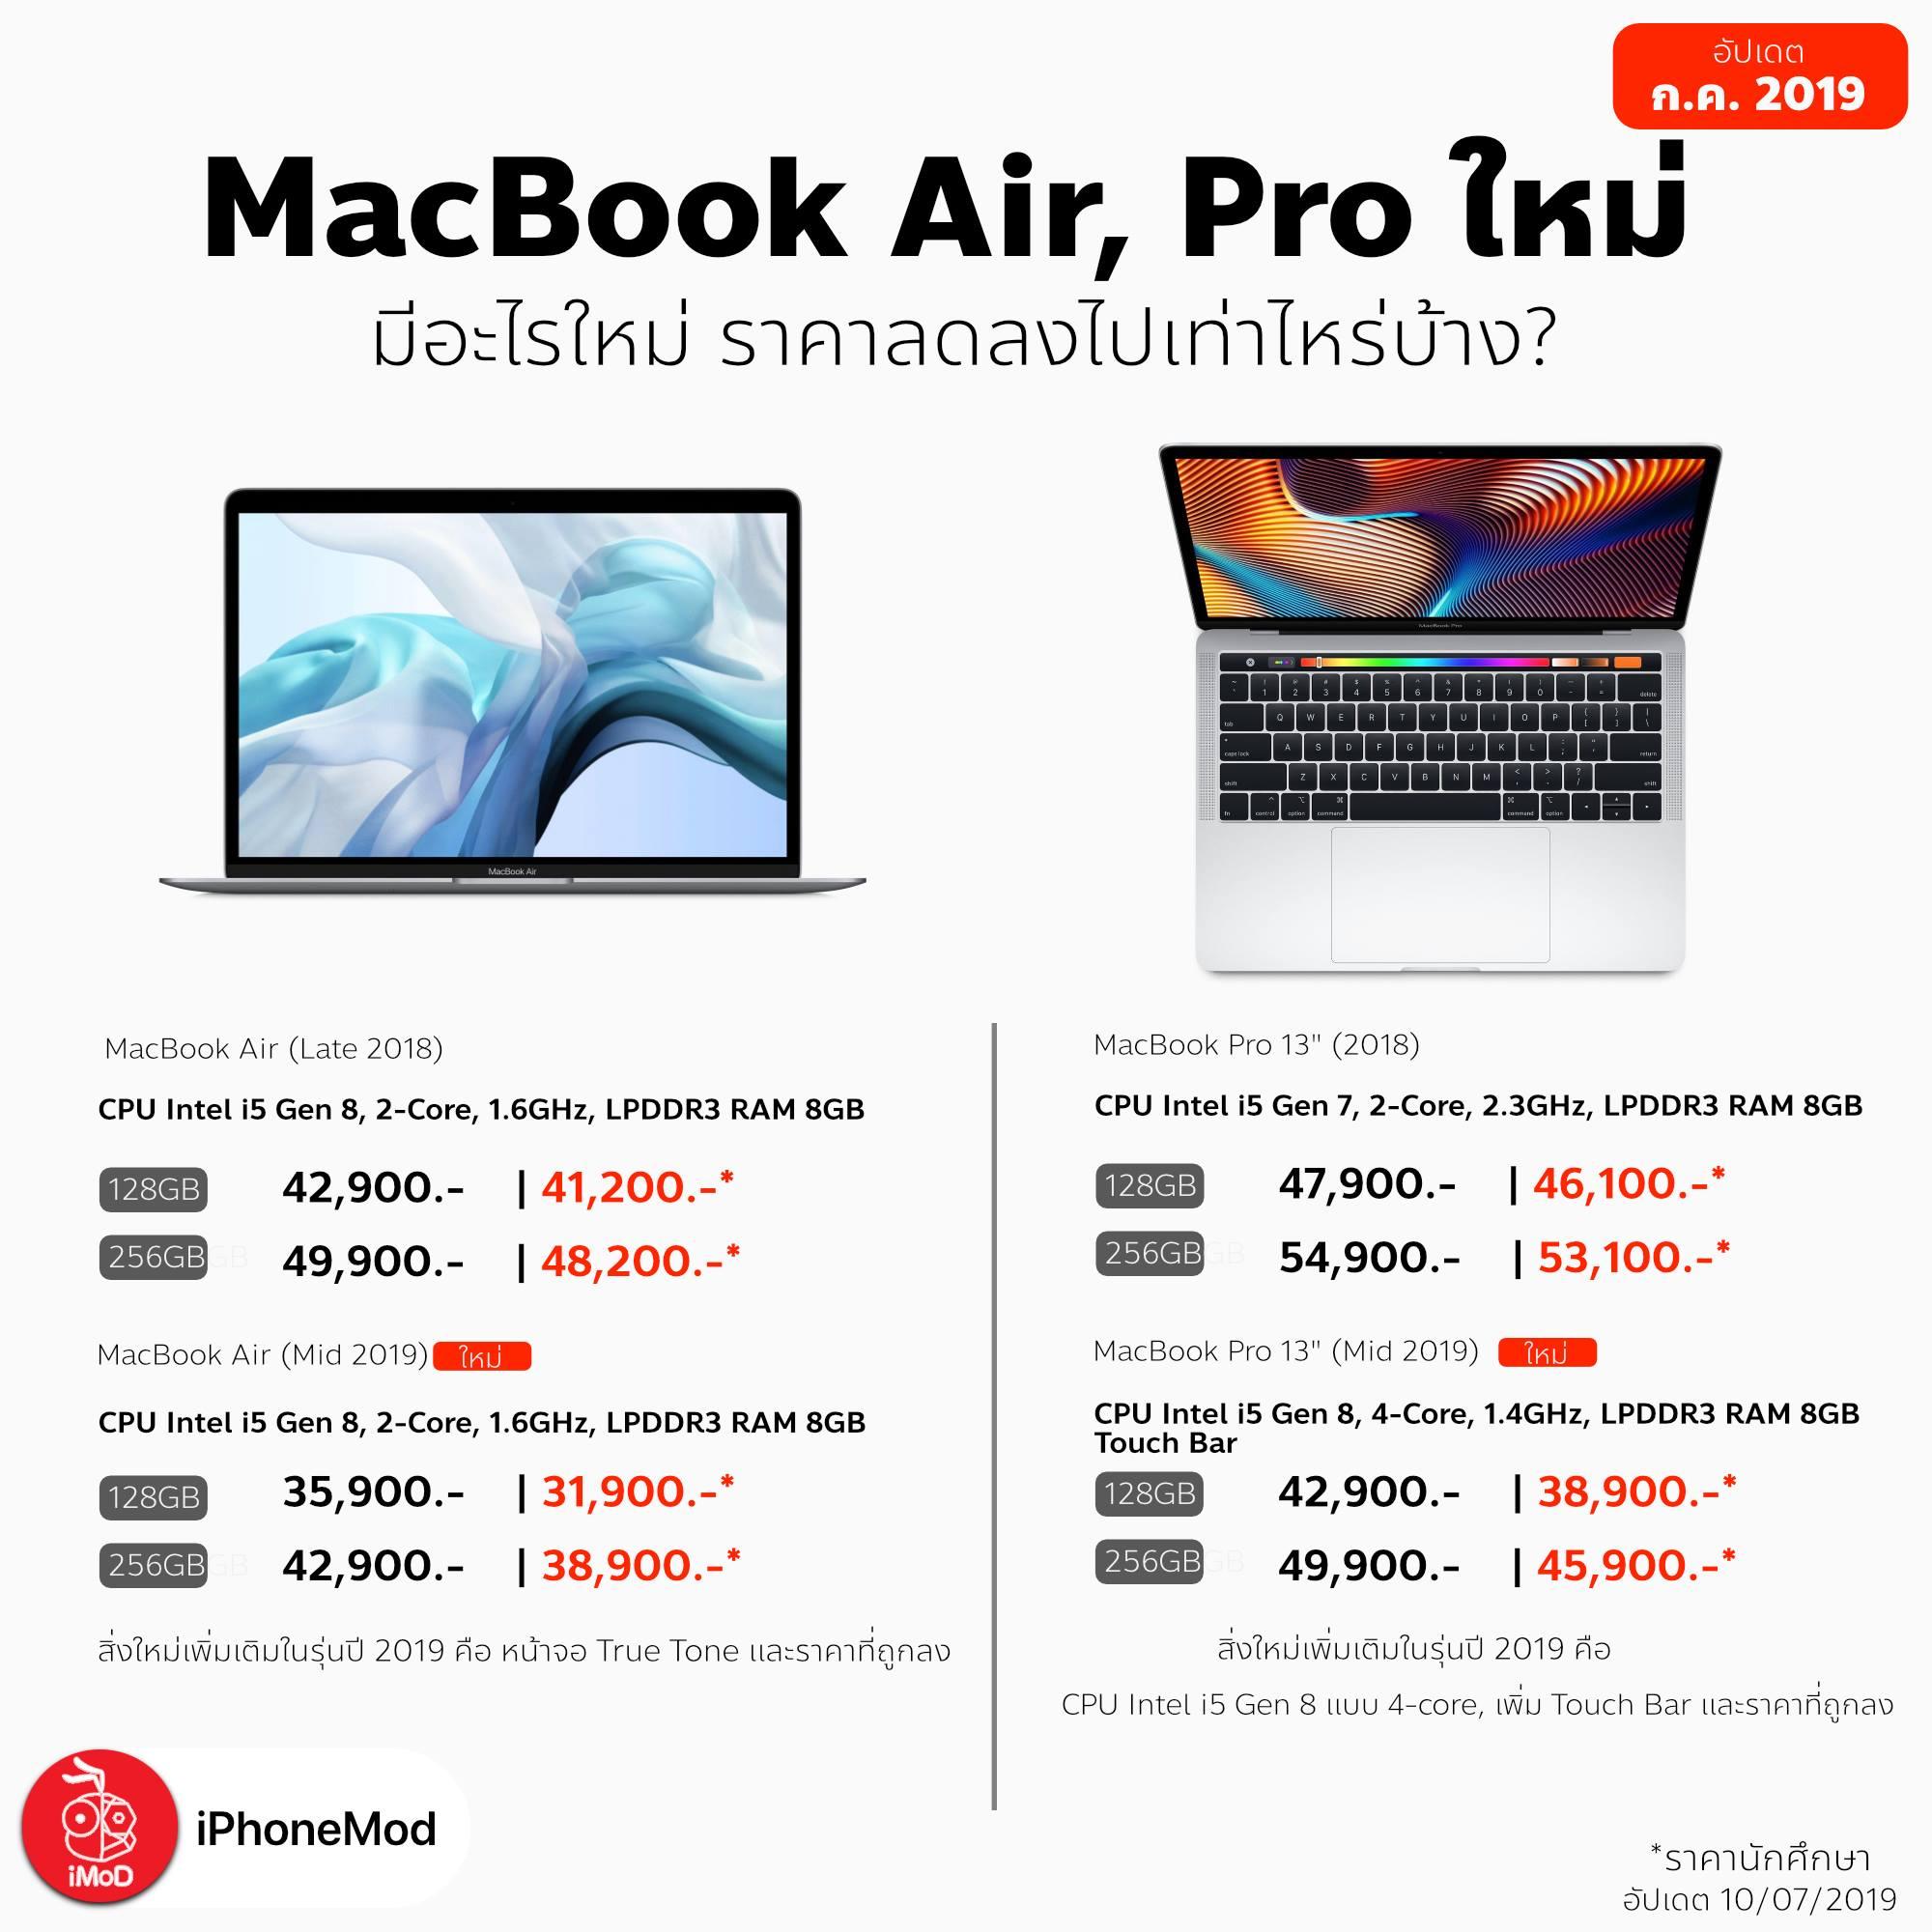 Macbook Air And Macbook Pro 13 Inch Mid 2019 Update